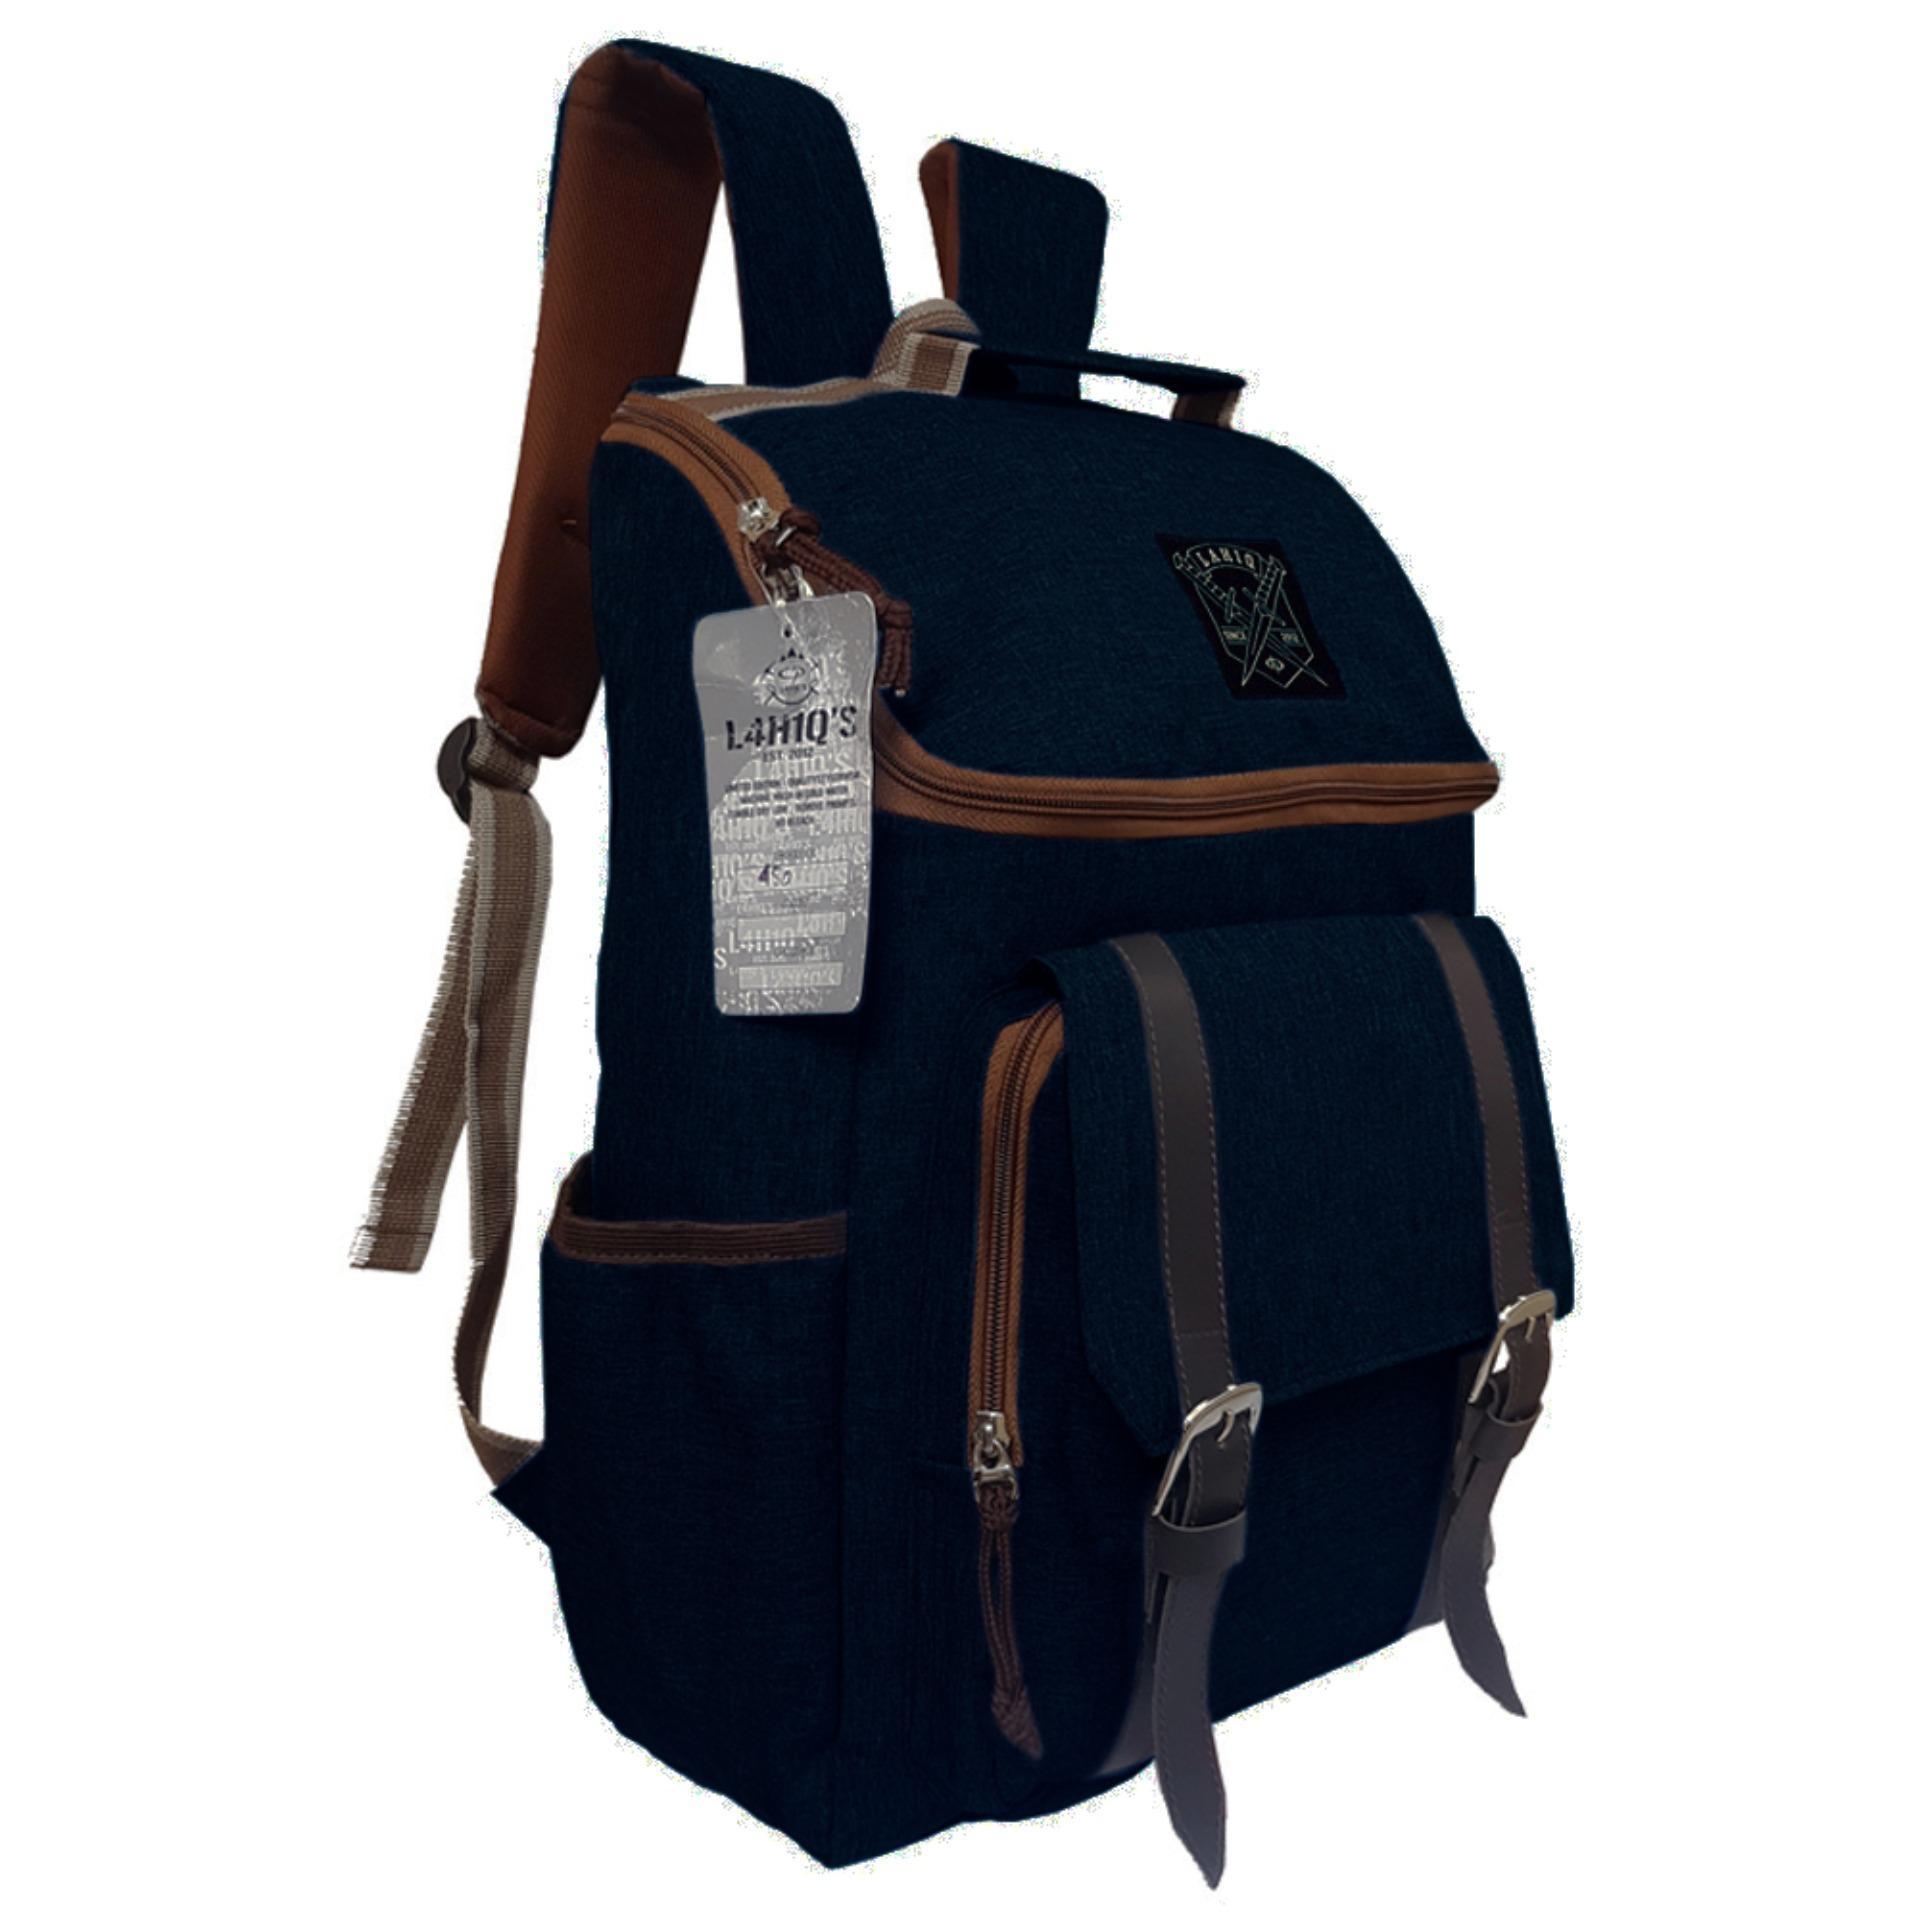 Tas Backpack Pria Wanita Kanvas   Punggung   Ransel Kuliah   Korean Bag  LLC7202 - Black ce594c111e